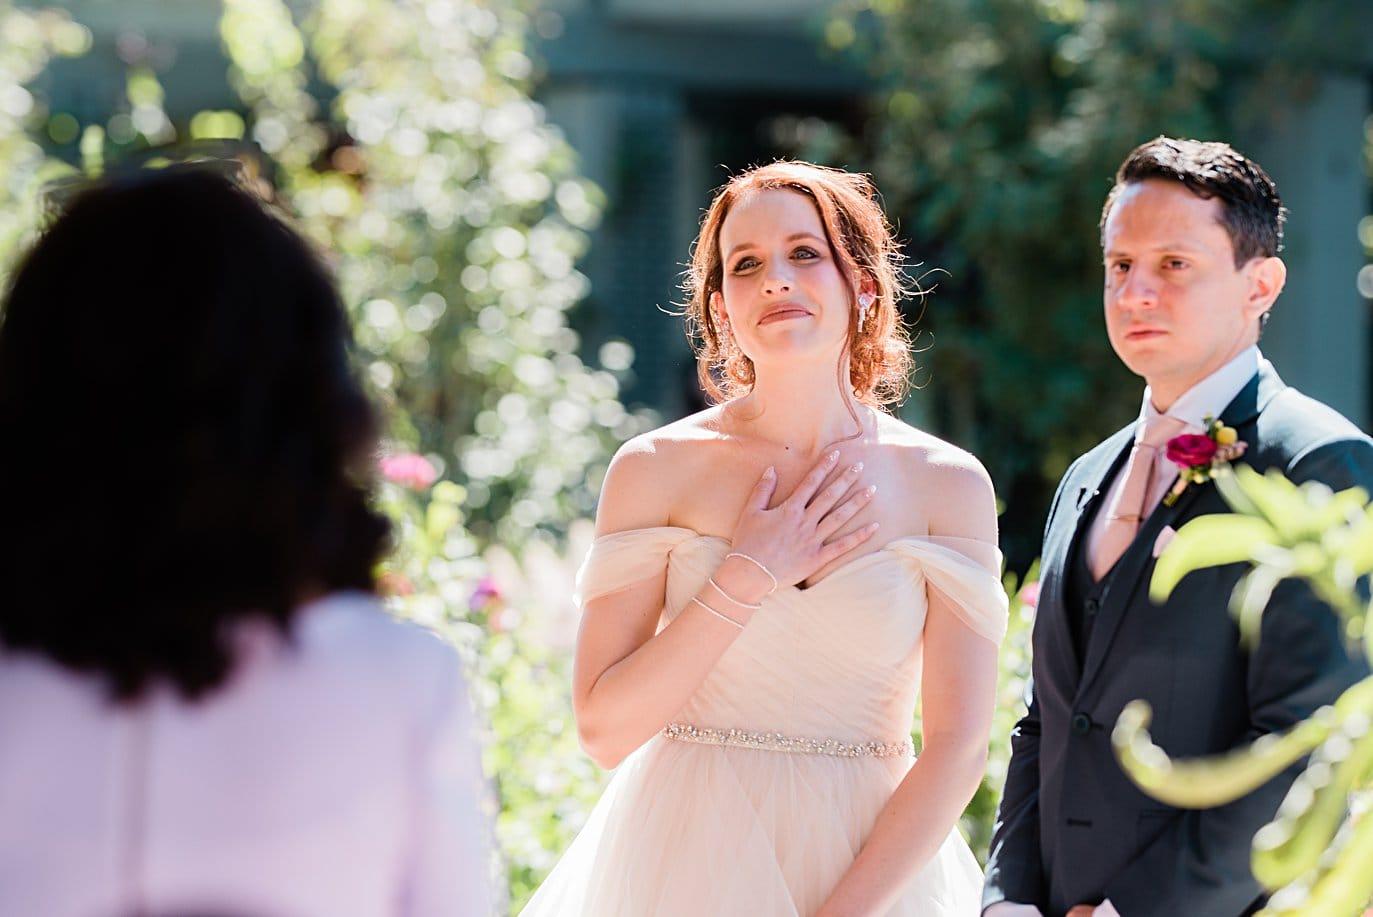 bride gets emotional during mother of groom speech at wedding ceremony at Denver Botanic Gardens microwedding by Denver wedding photographer Jennie Crate